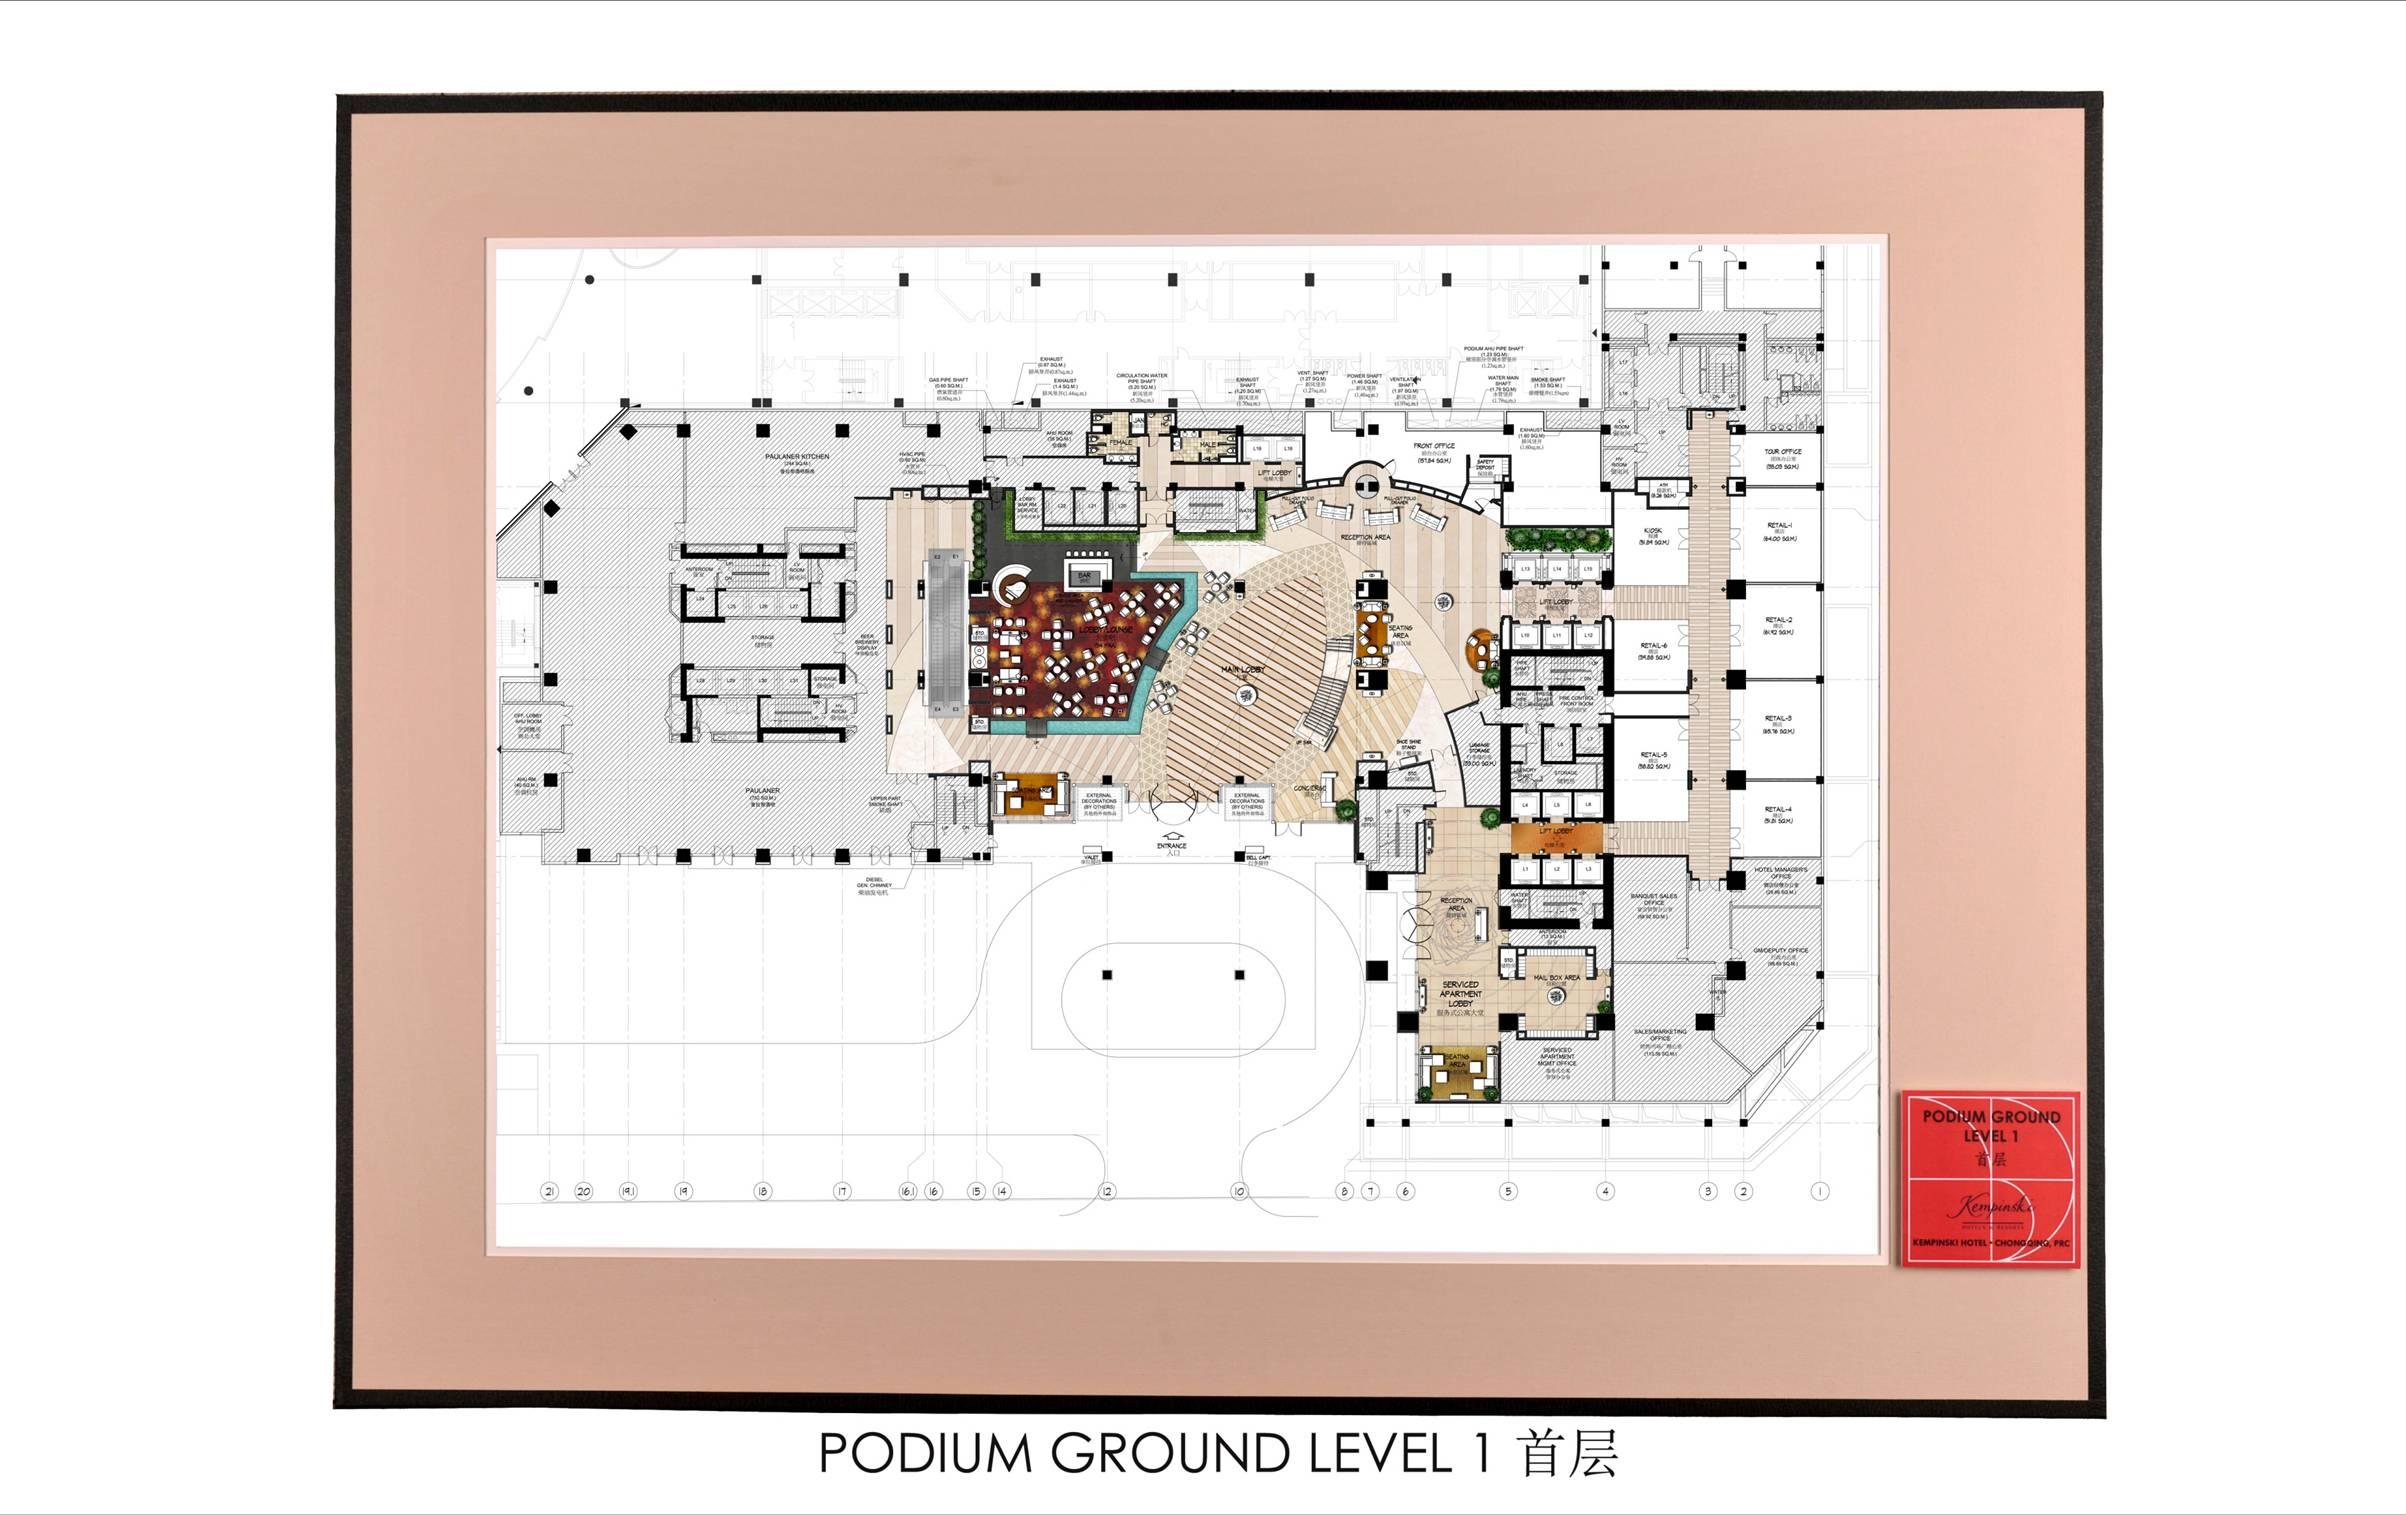 kempinski hotel chongqing prc by chin hei ng at coroflot com main lobby floor plan